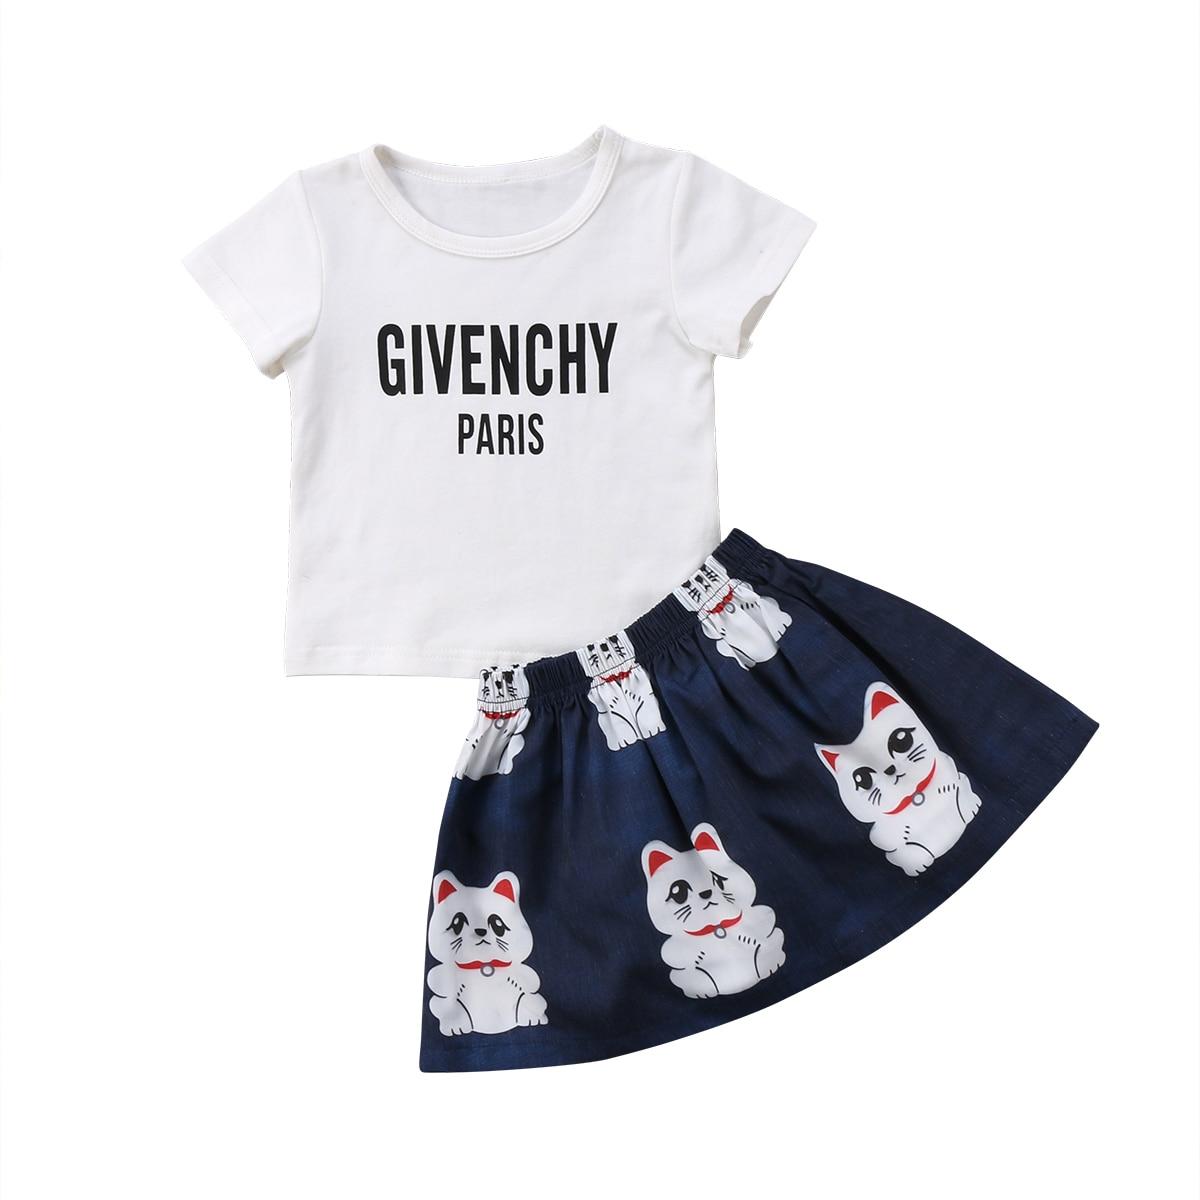 Toddler Kids Baby Girls Cotton Letter T-shirt Tops+Cats Cartoon Pattern Dress Outfits T-shirt Clothes 2PCS Set